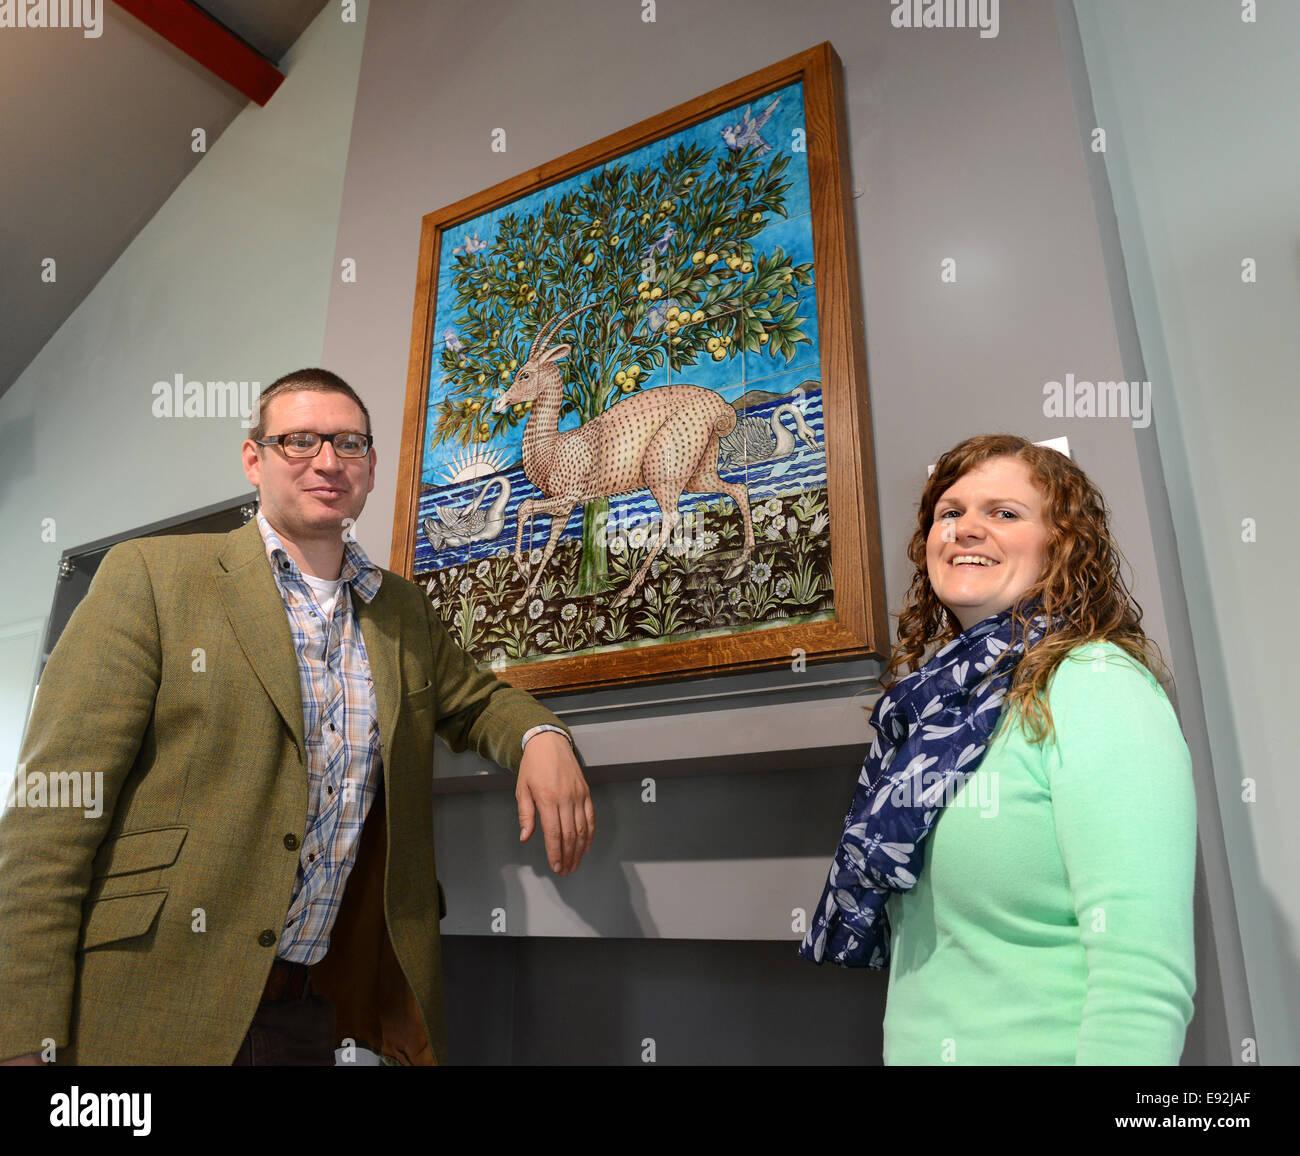 Jackfield Tile Museum senior curator Dr Matt Thompson and Gillian Crumpton (Curator) with the 'World class' - Stock Image